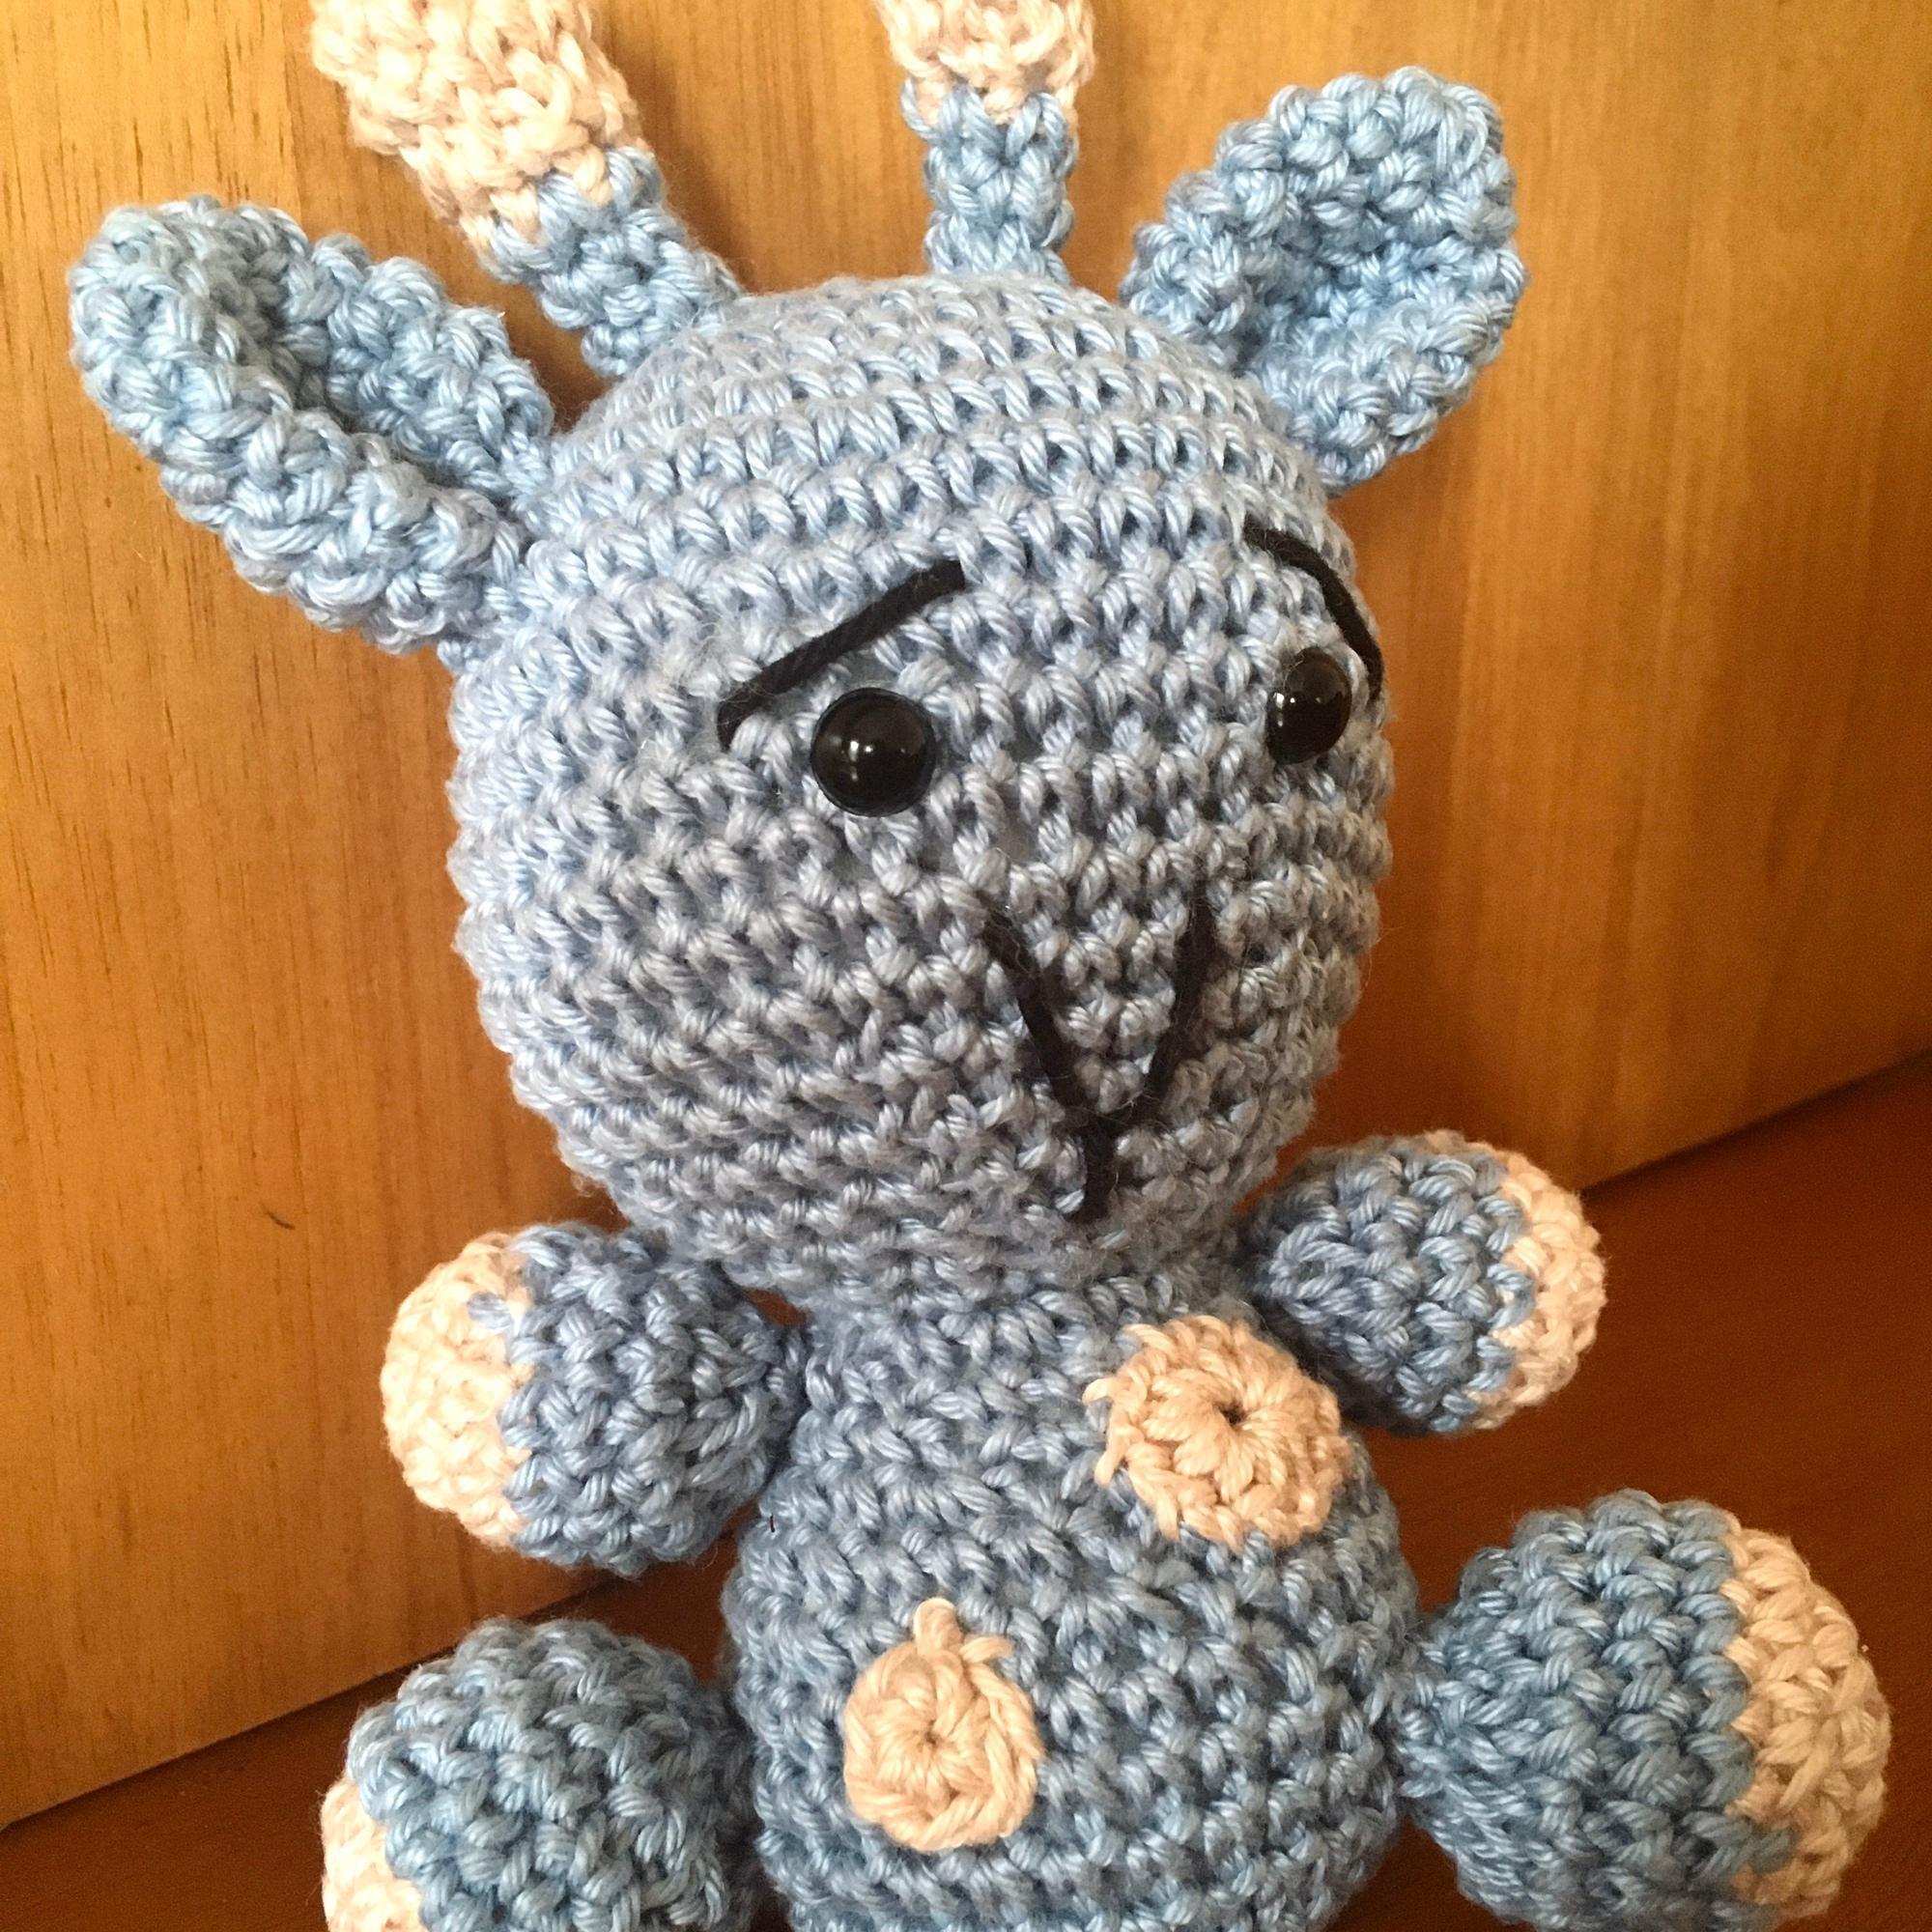 Amigurumi Girafa de Croche | Amigurumi de animais de crochê ... | 2000x2000